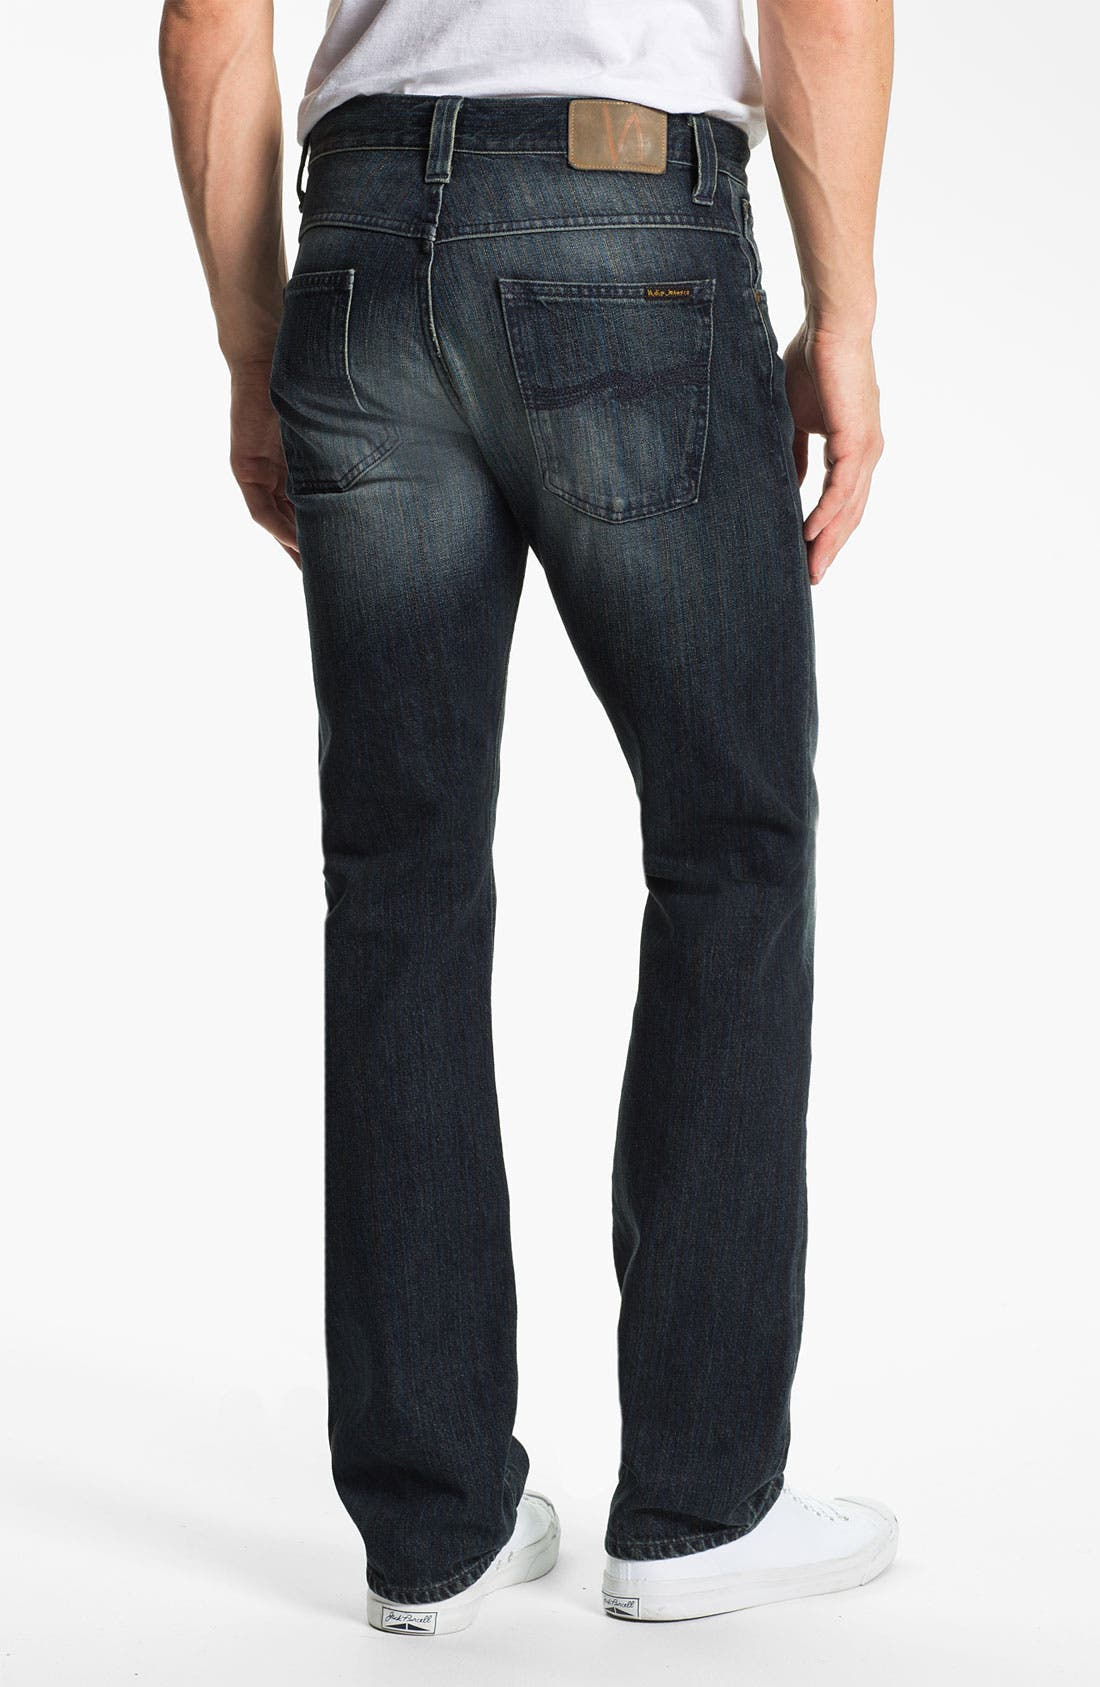 Alternate Image 1 Selected - Nudie 'Average Joe' Straight Leg Jeans (Organic Black and Blue)